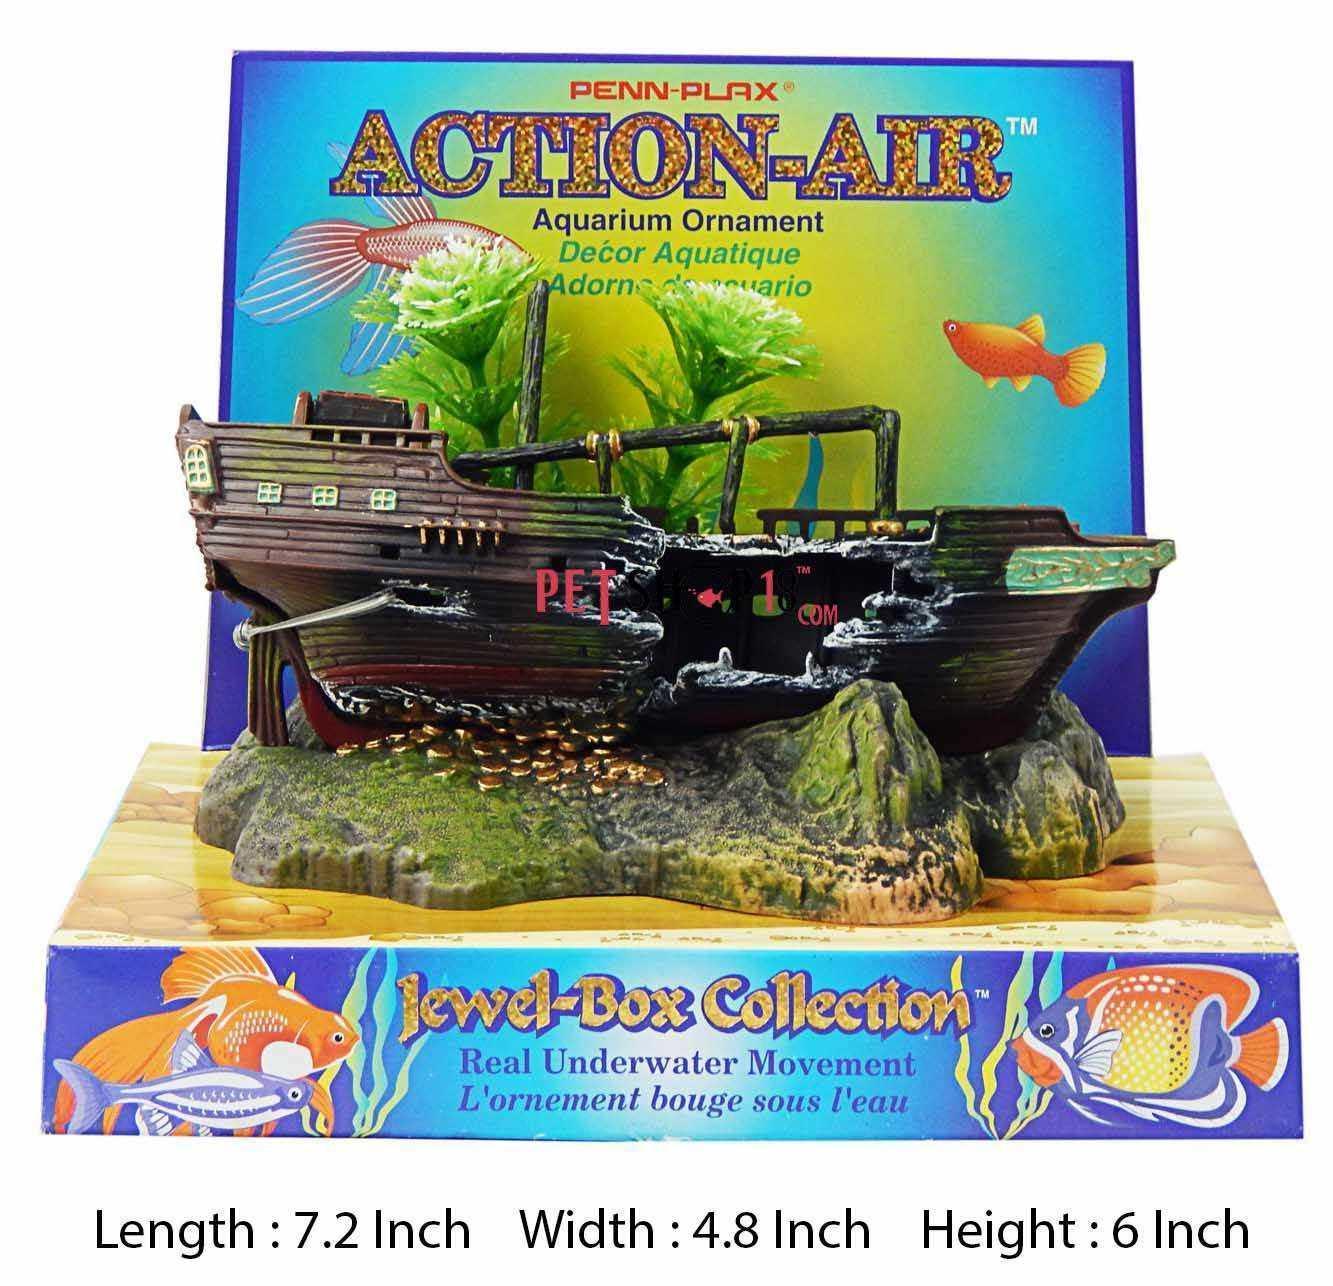 Fish aquarium in karnal - Broken Ship With Tree Aquarium Toy